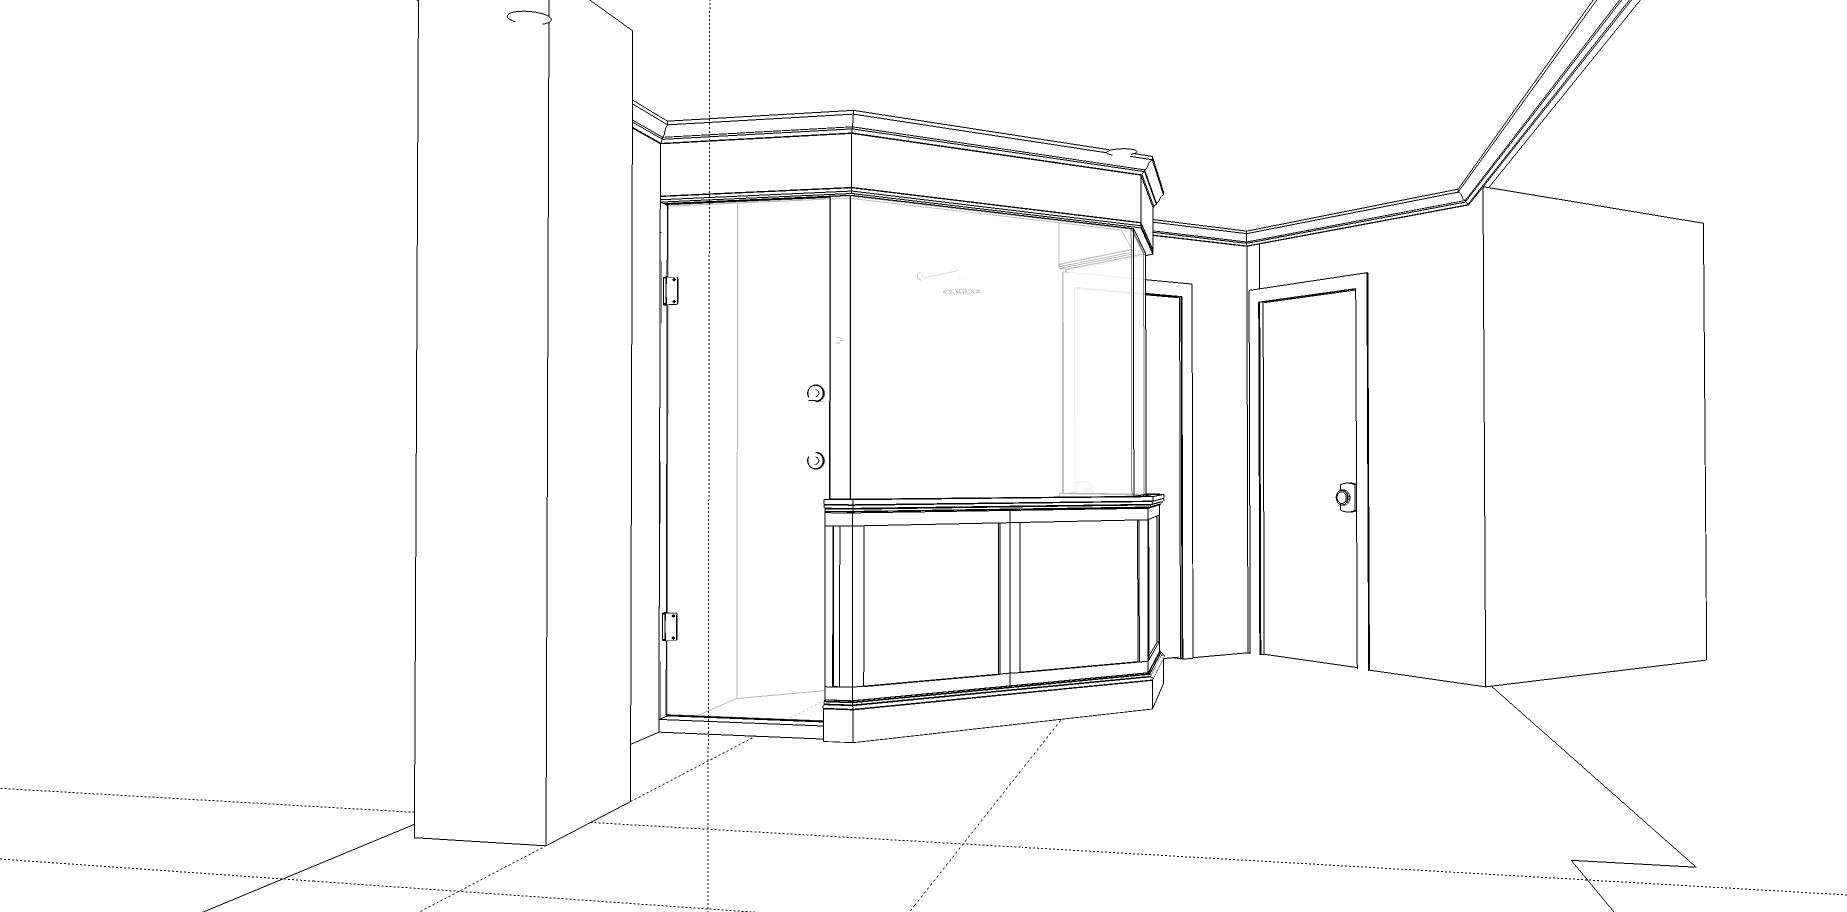 layout-03-11-bath-04.png